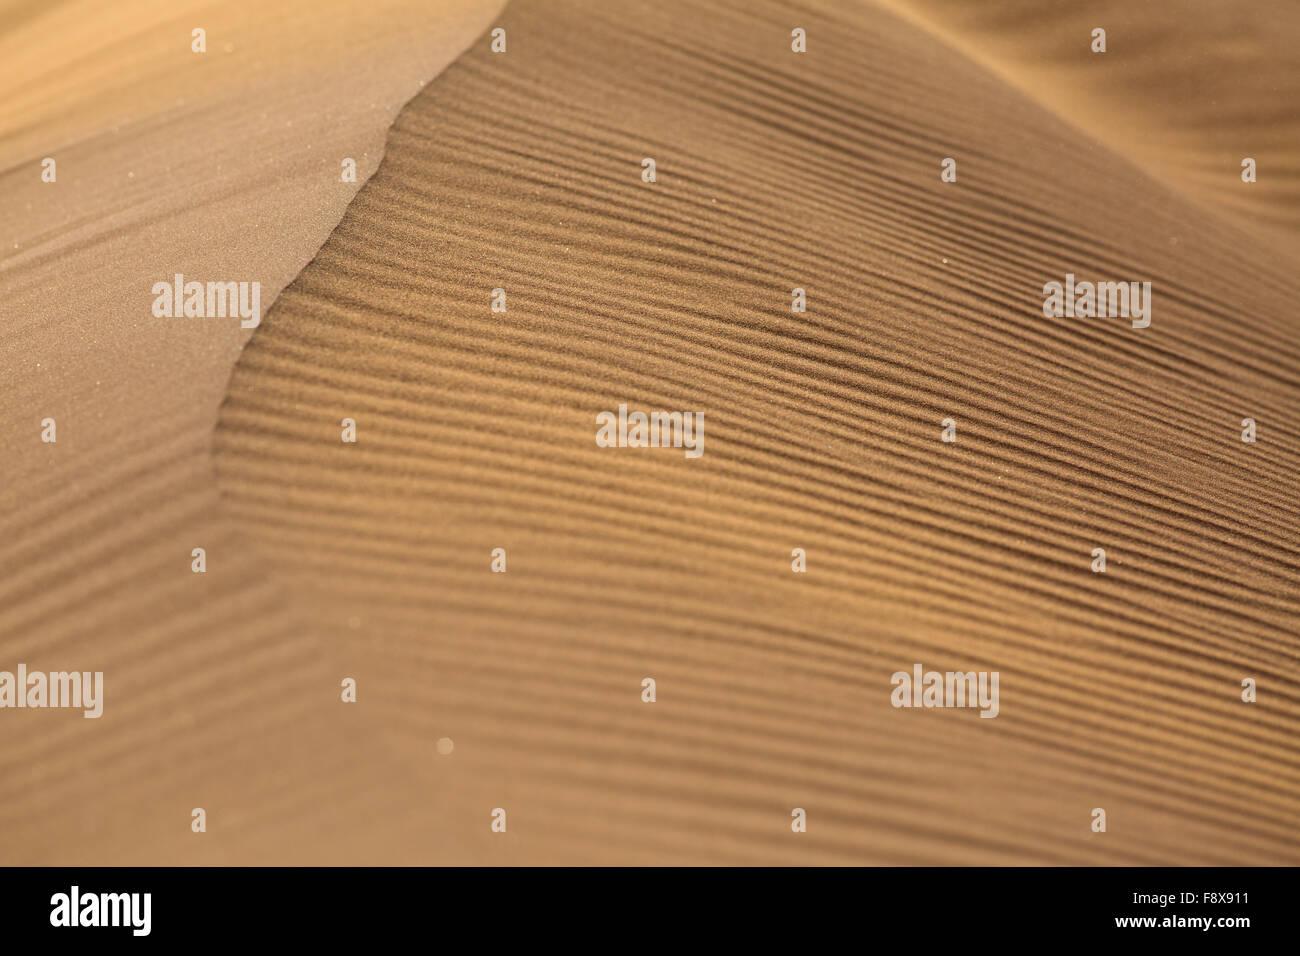 Wind erosion patterns on a dune in Sossusvlei, Namib-Naukluft Park, Namibia - Stock Image